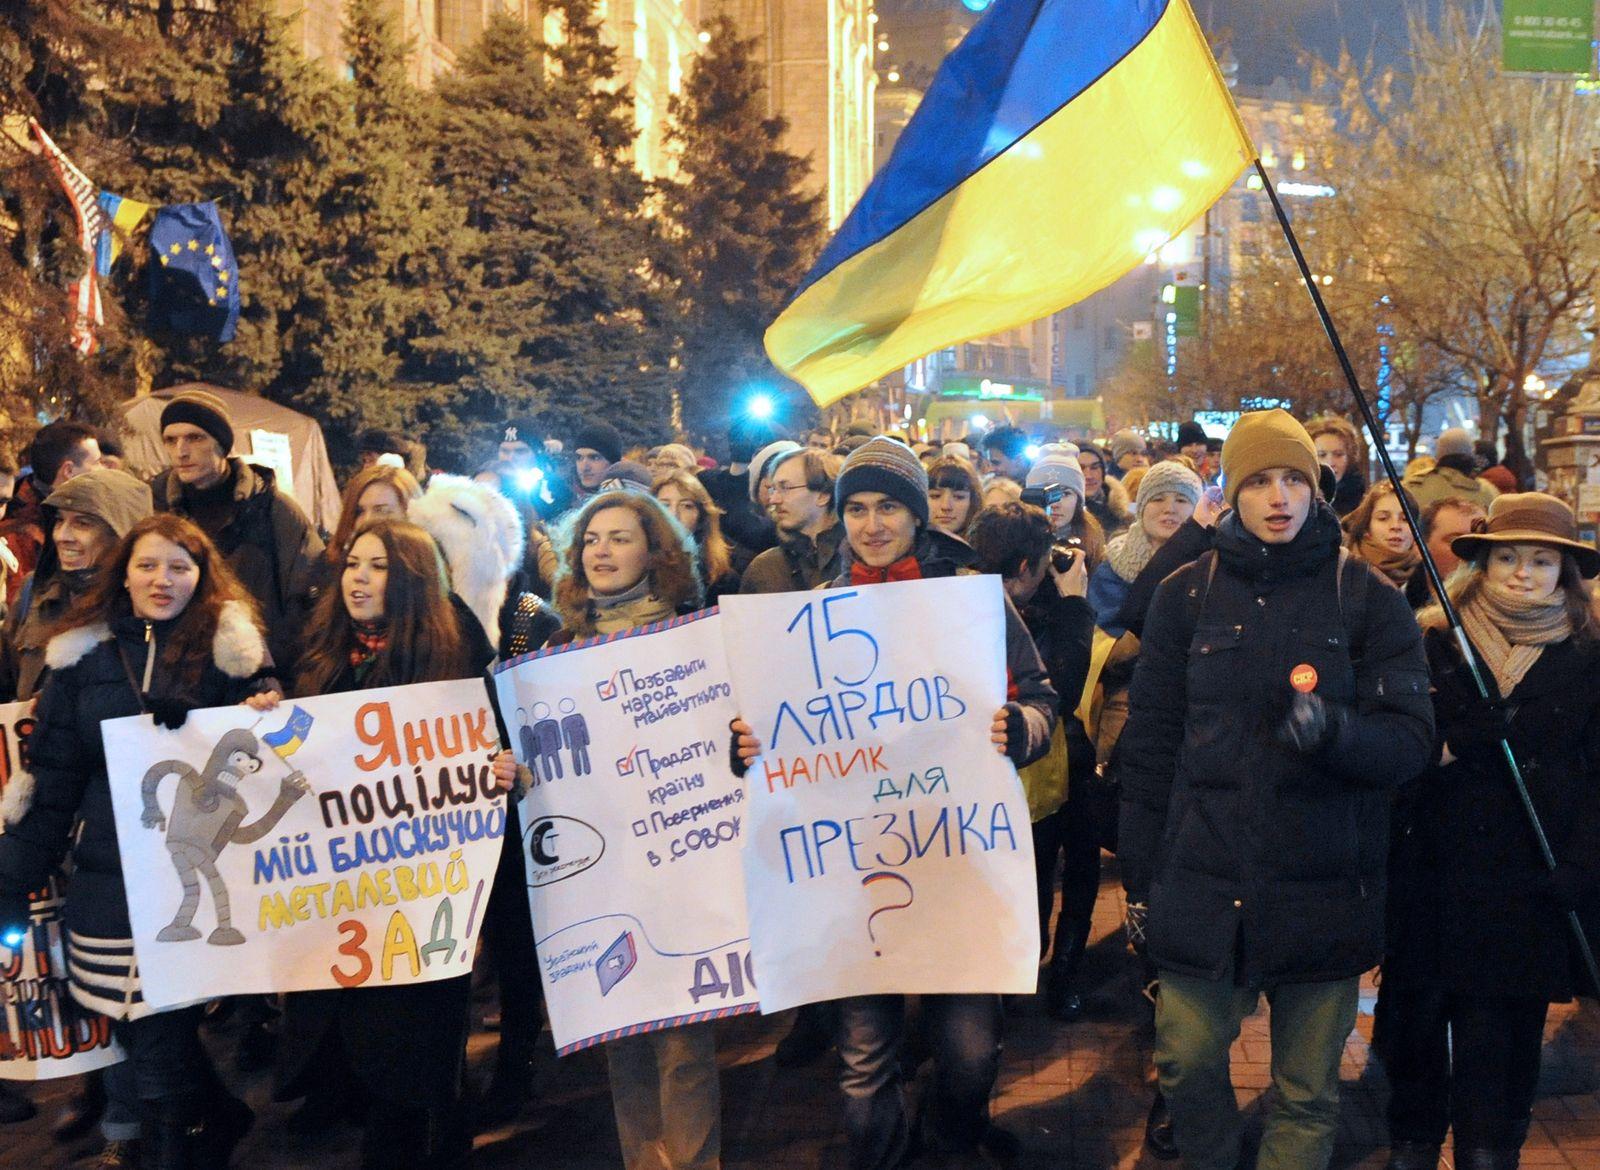 UKRAINE-UNREST-EU-RUSSIA-PROTEST